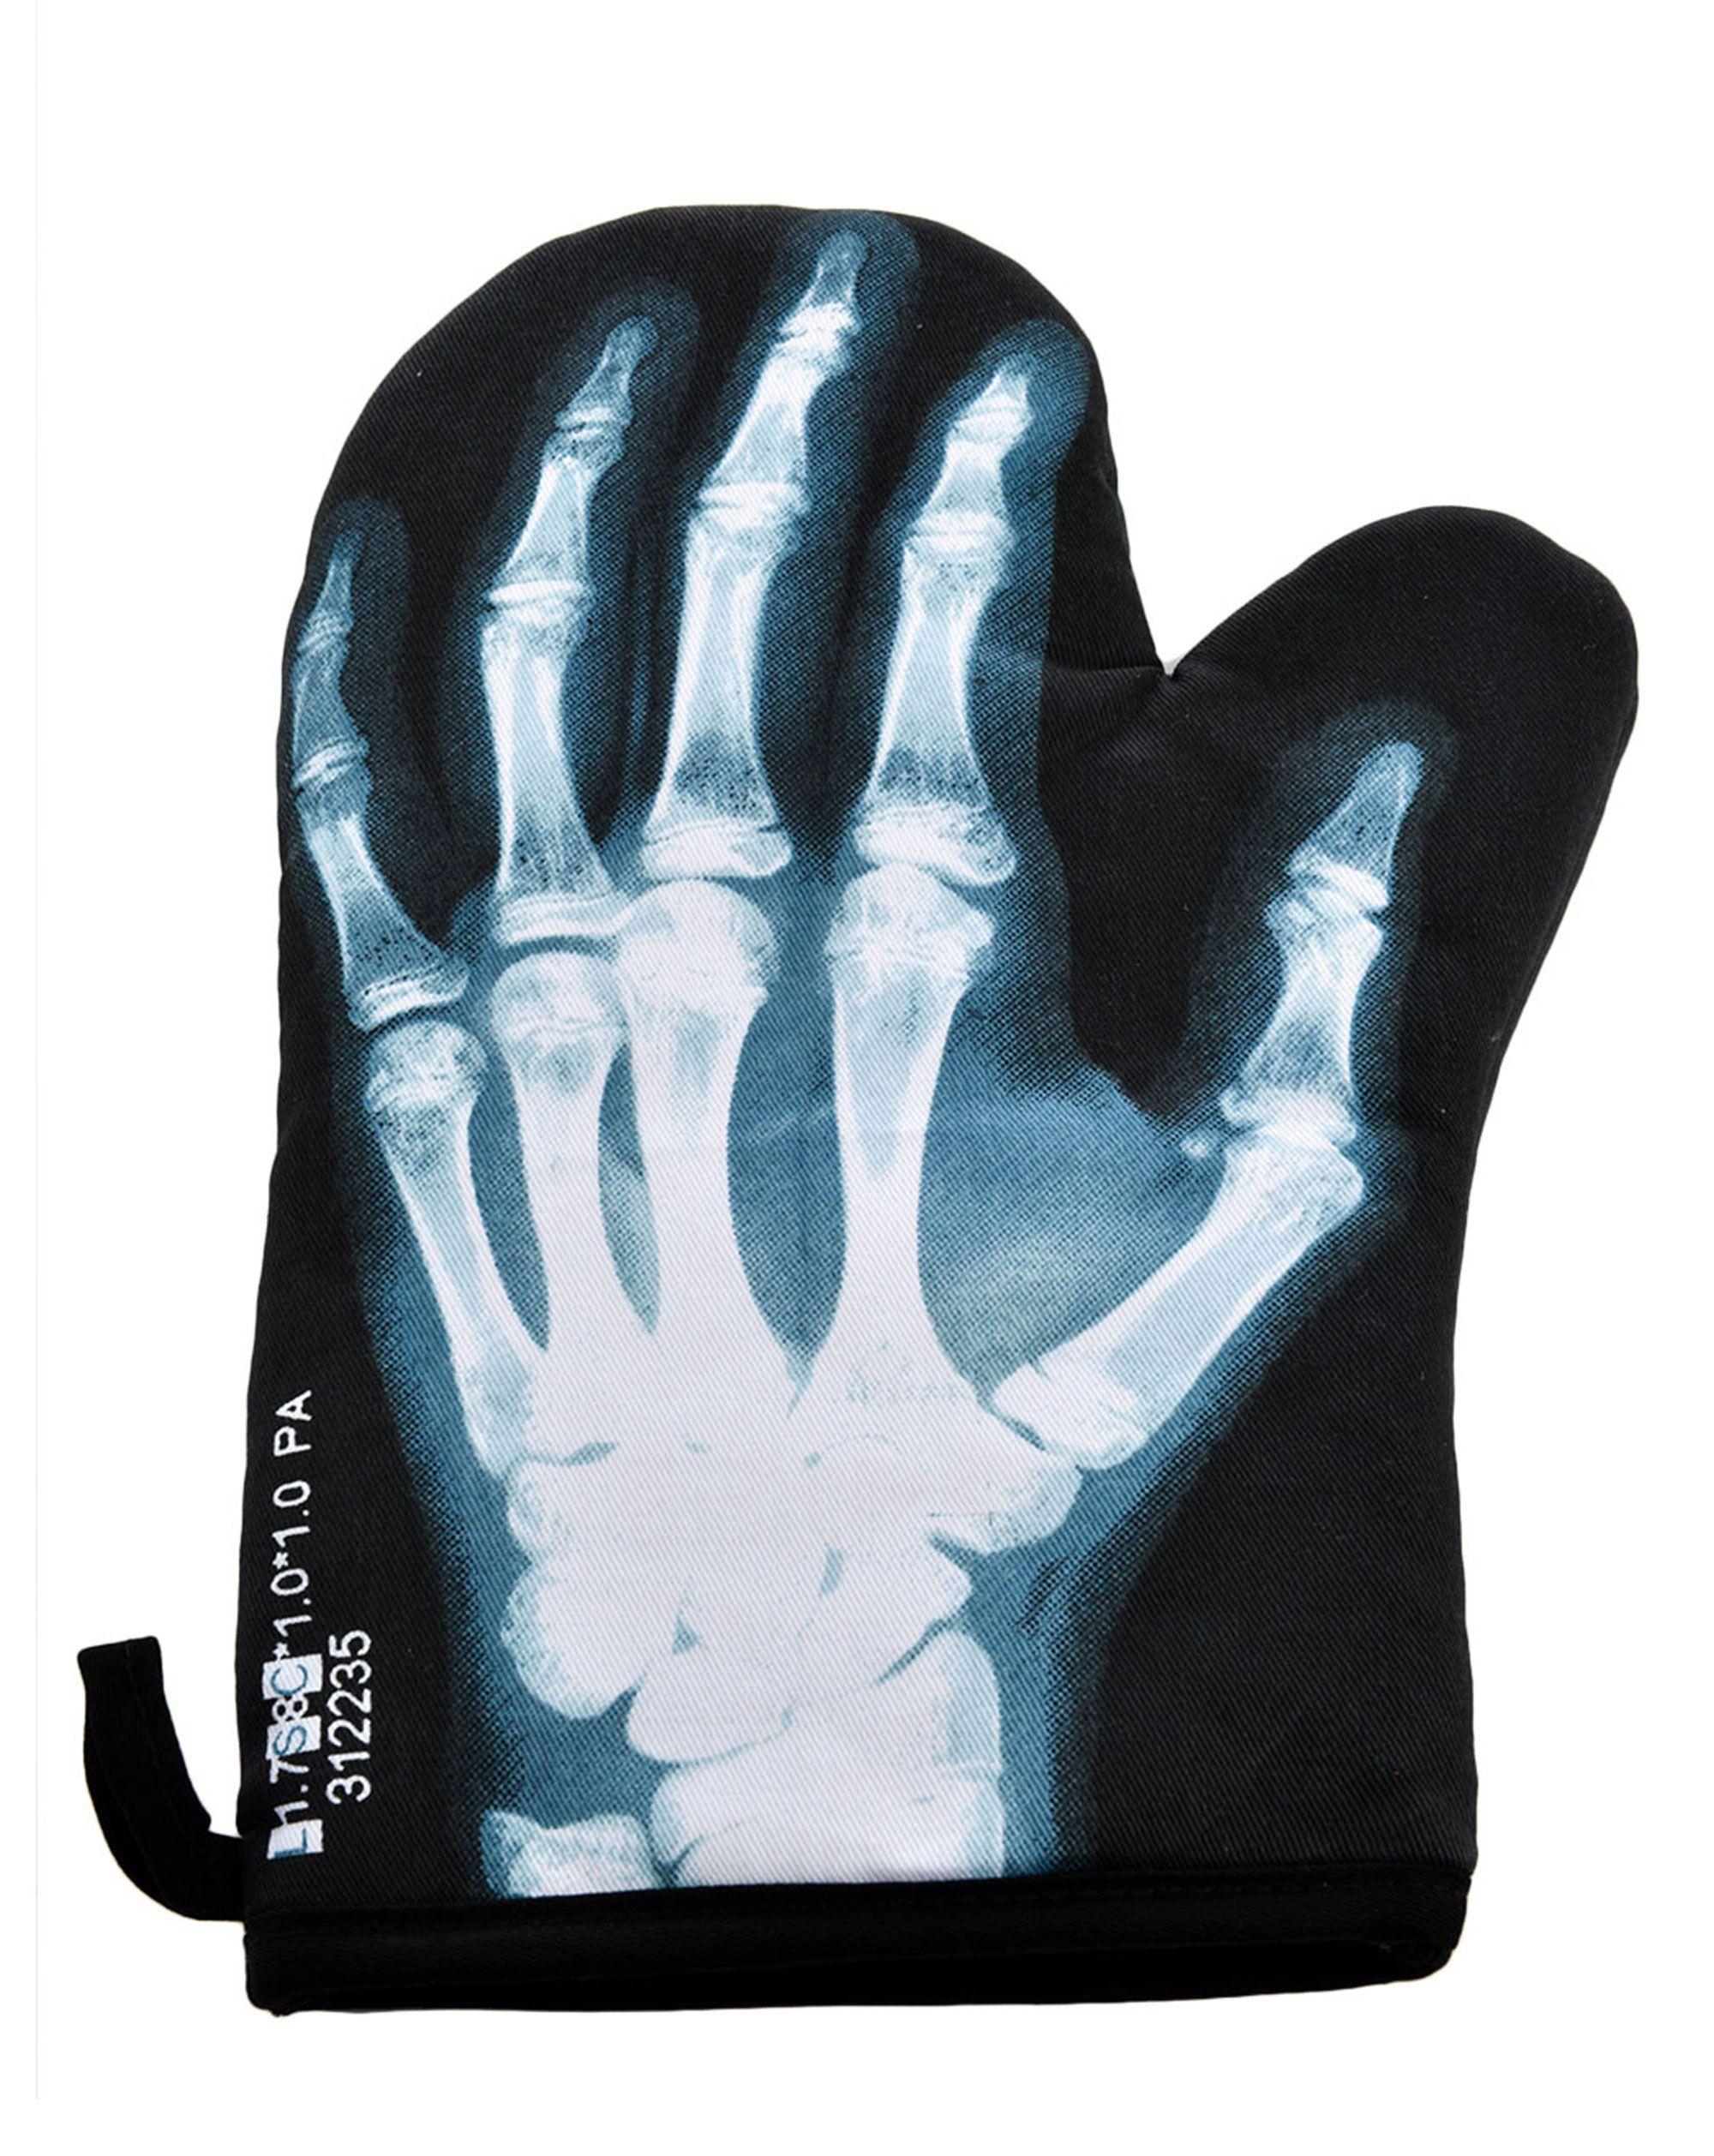 X-Ray Skeleton Oven Mitt Glove | Things- Kitchen | Pinterest ...